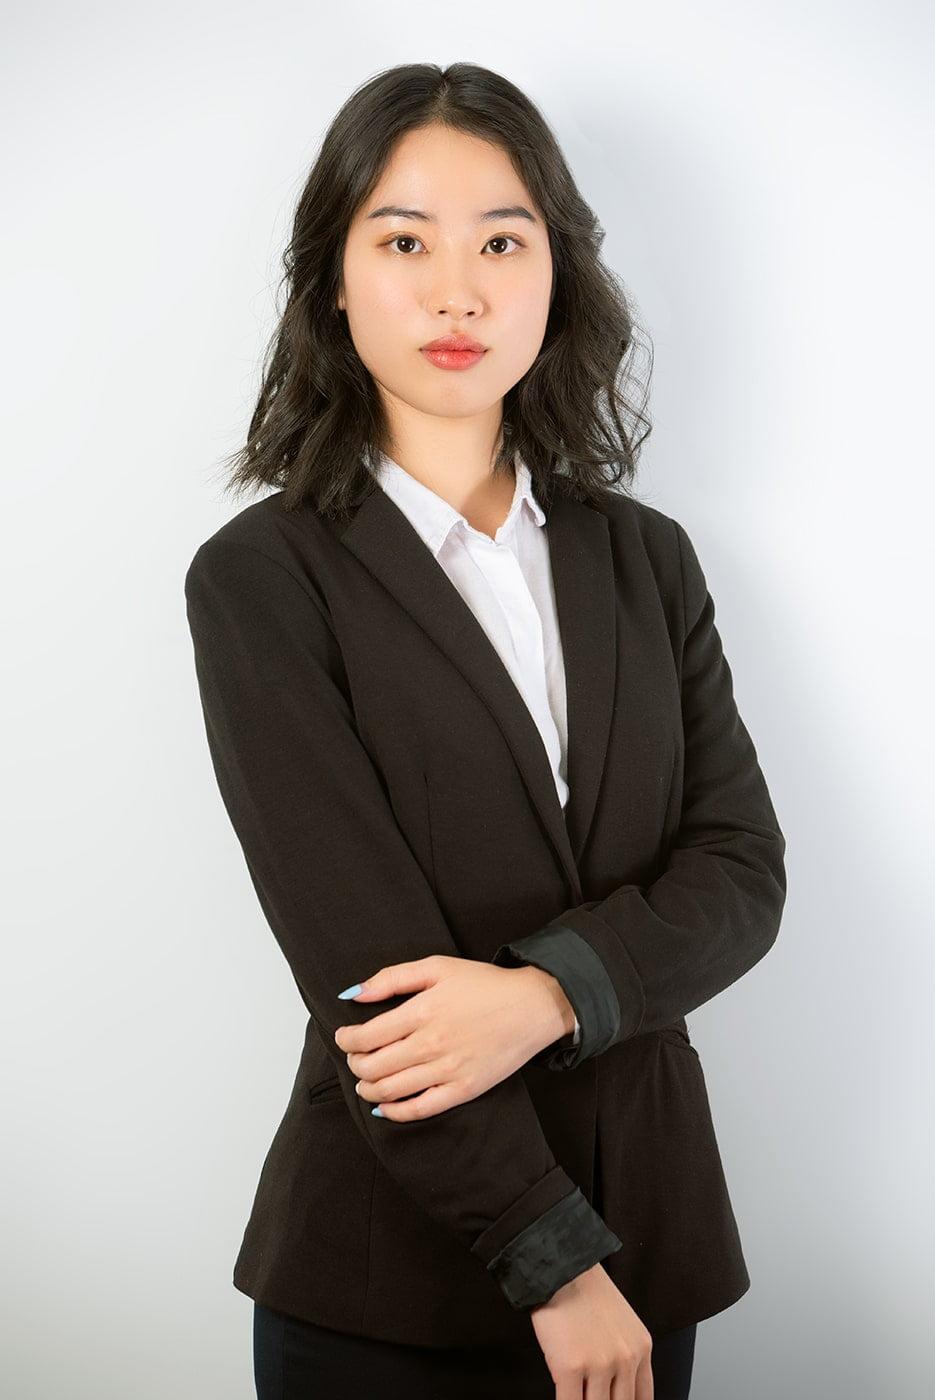 Profile cong ty 19 - Album chụp ảnh profile công ty Luật Dzungsrt Law - HThao Studio